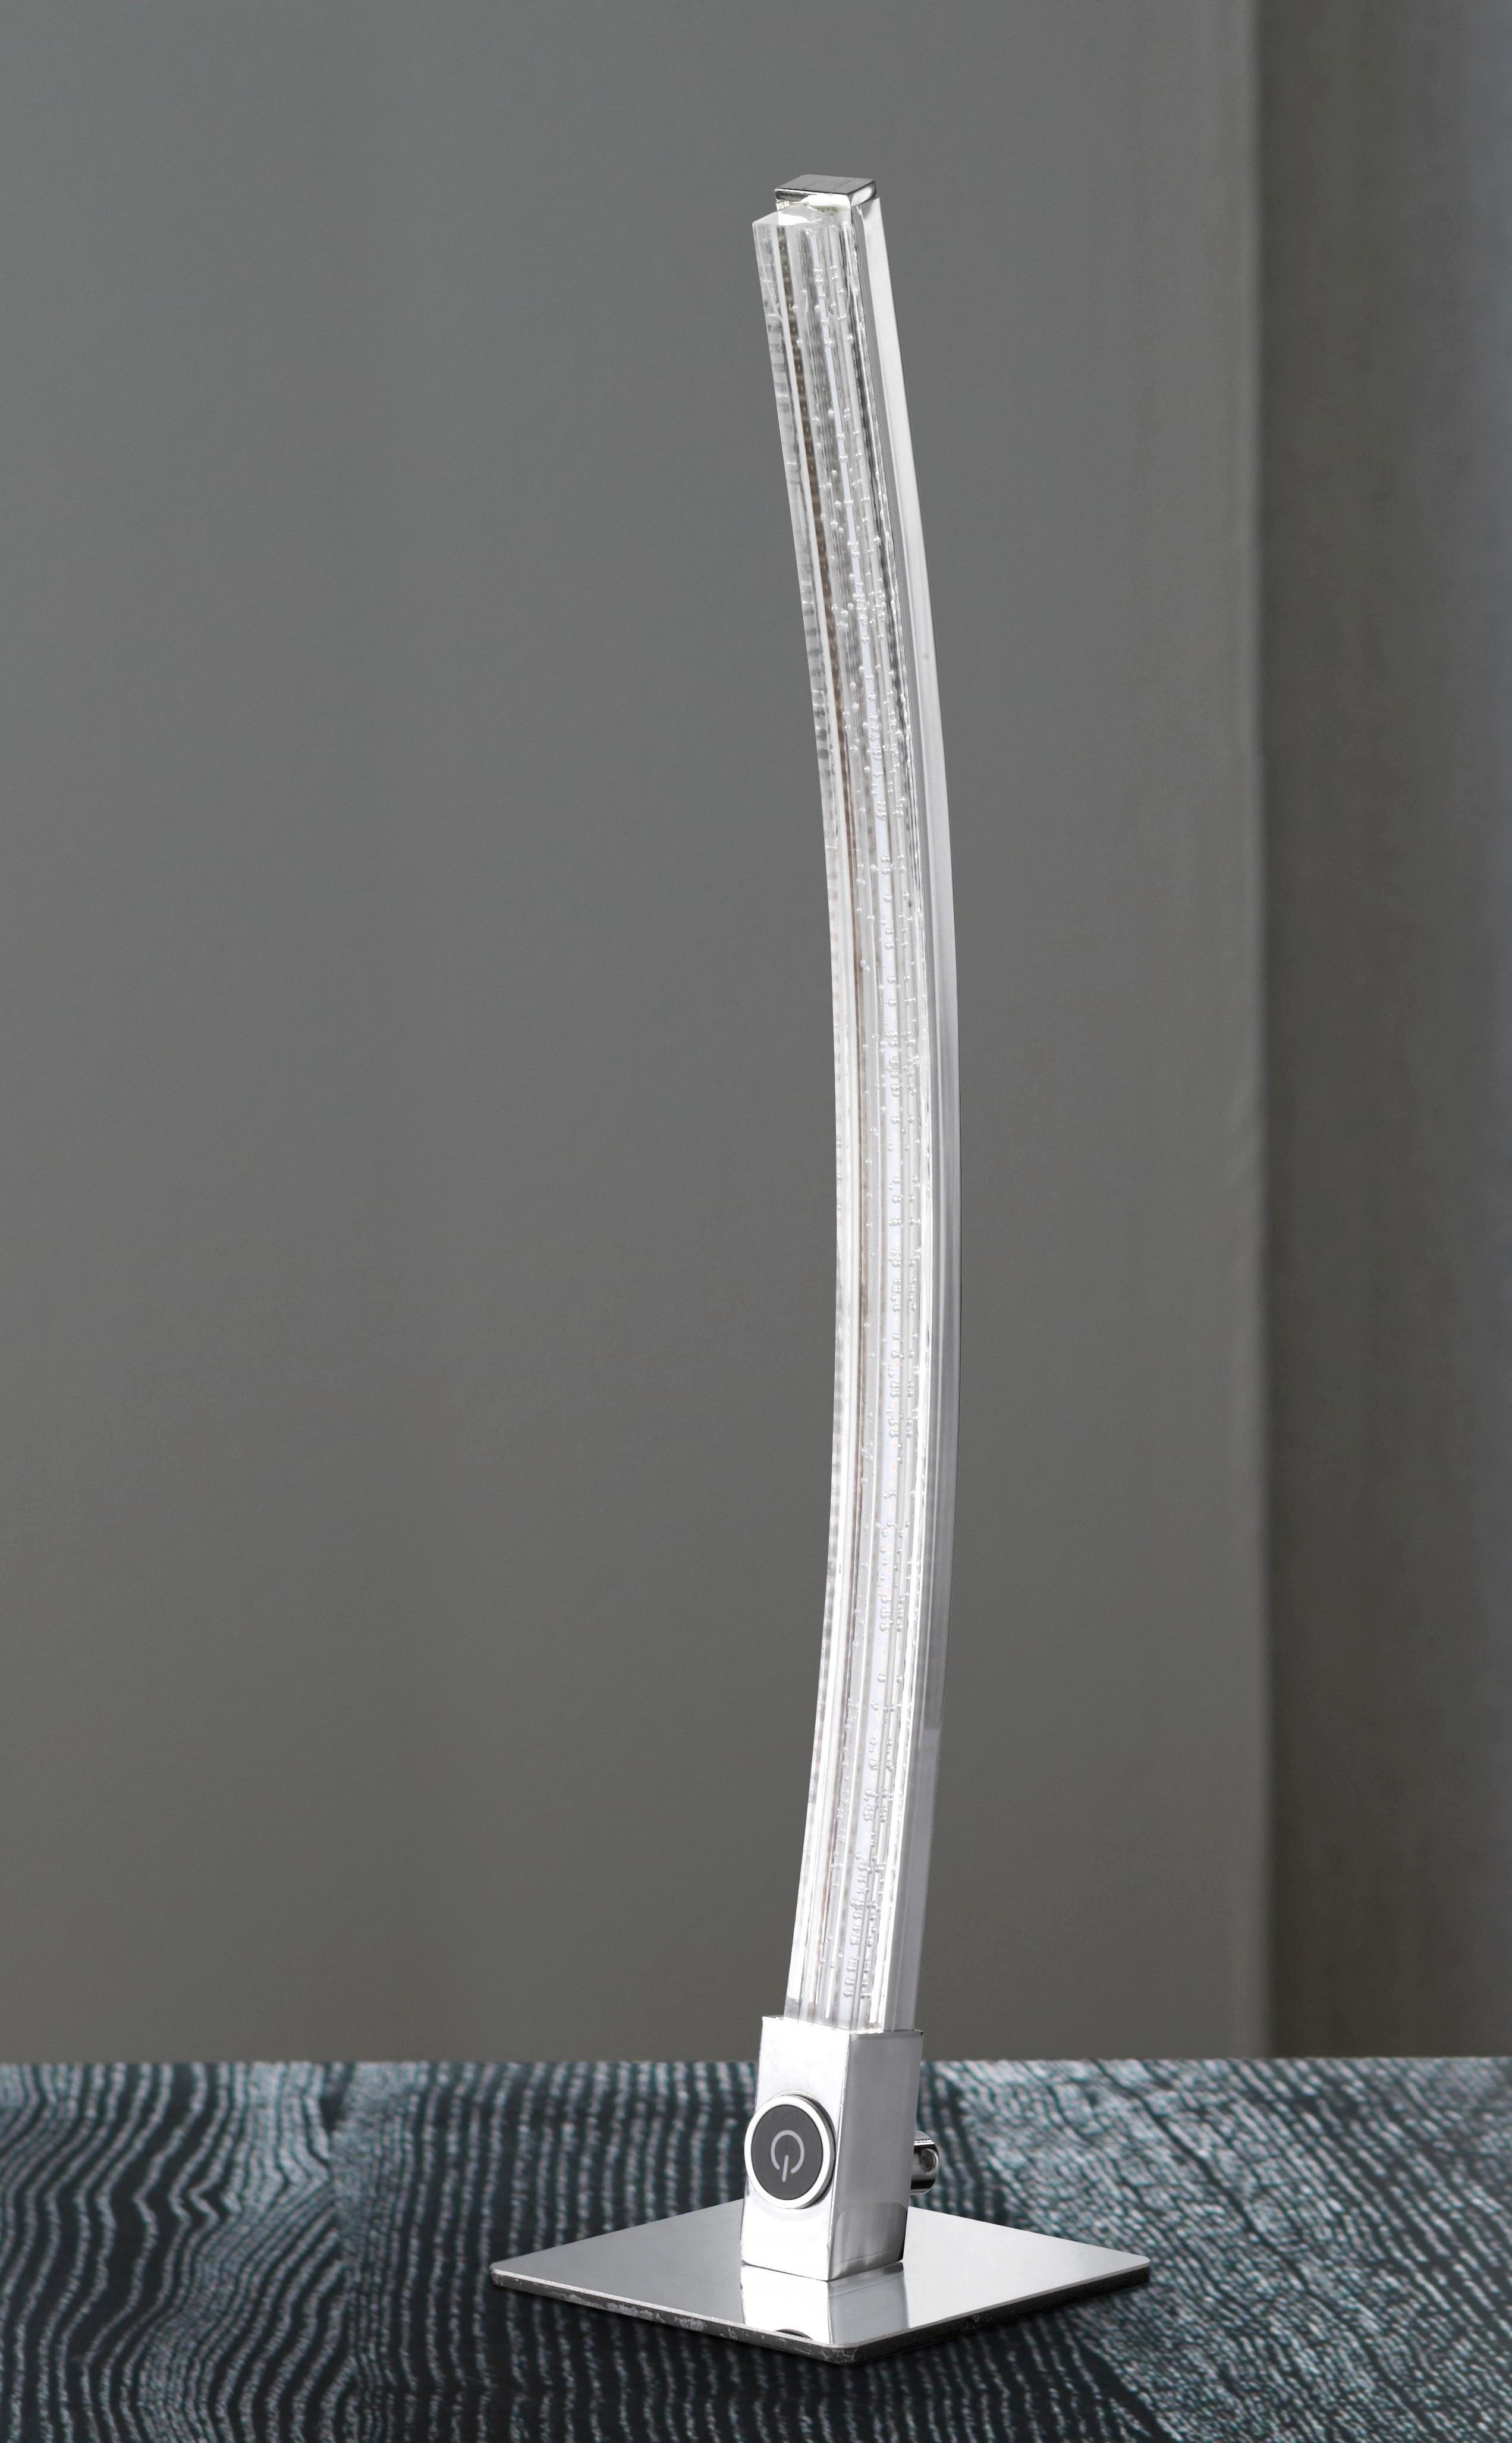 LED-TISCHLEUCHTE - Chromfarben, Design, Kunststoff/Metall (10/43,5/10cm)